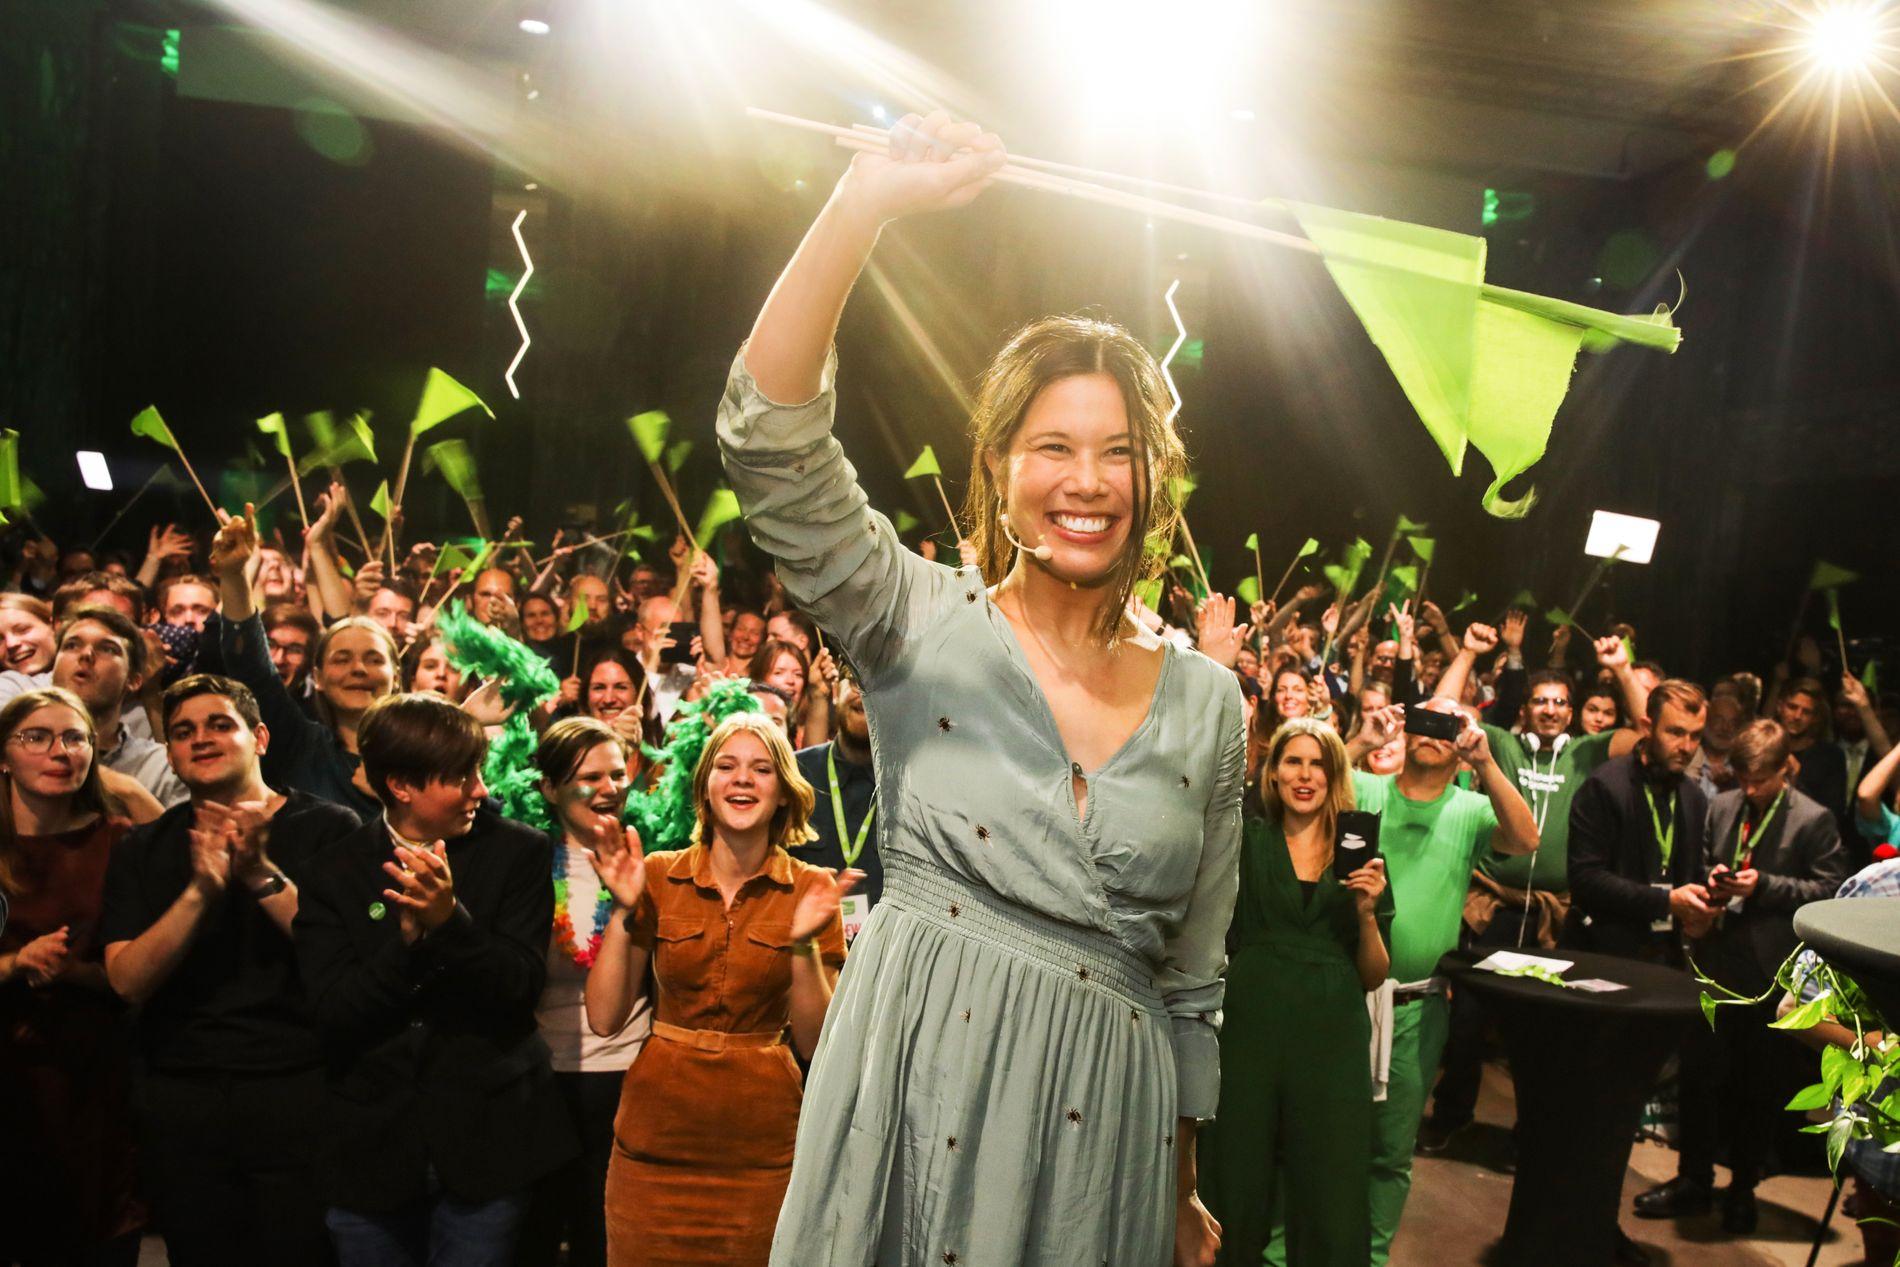 Valgvinnere i Oslo - tør de utfordre Norge i EU-spørsmålet?